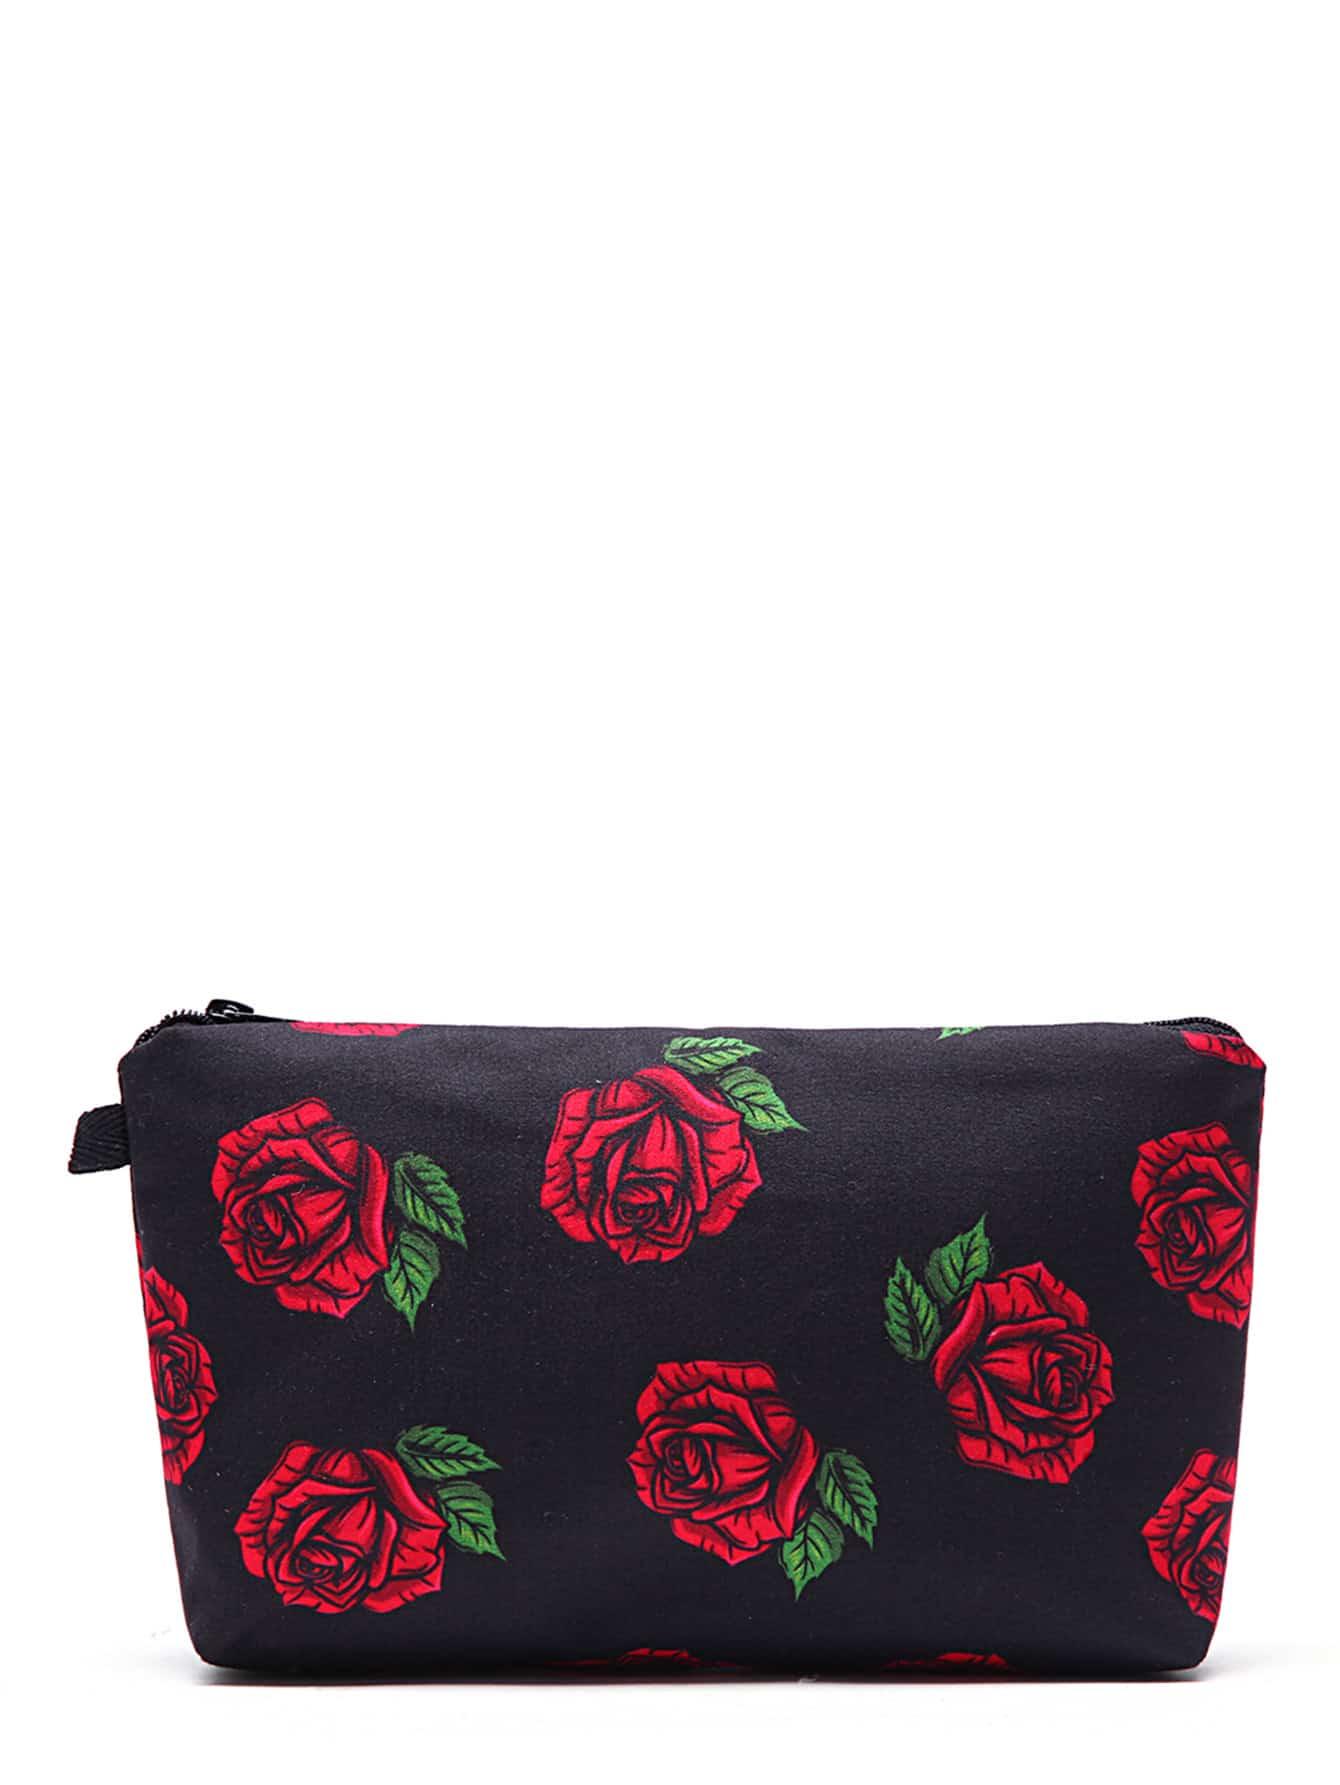 Rose Flower Print Makeup Bag